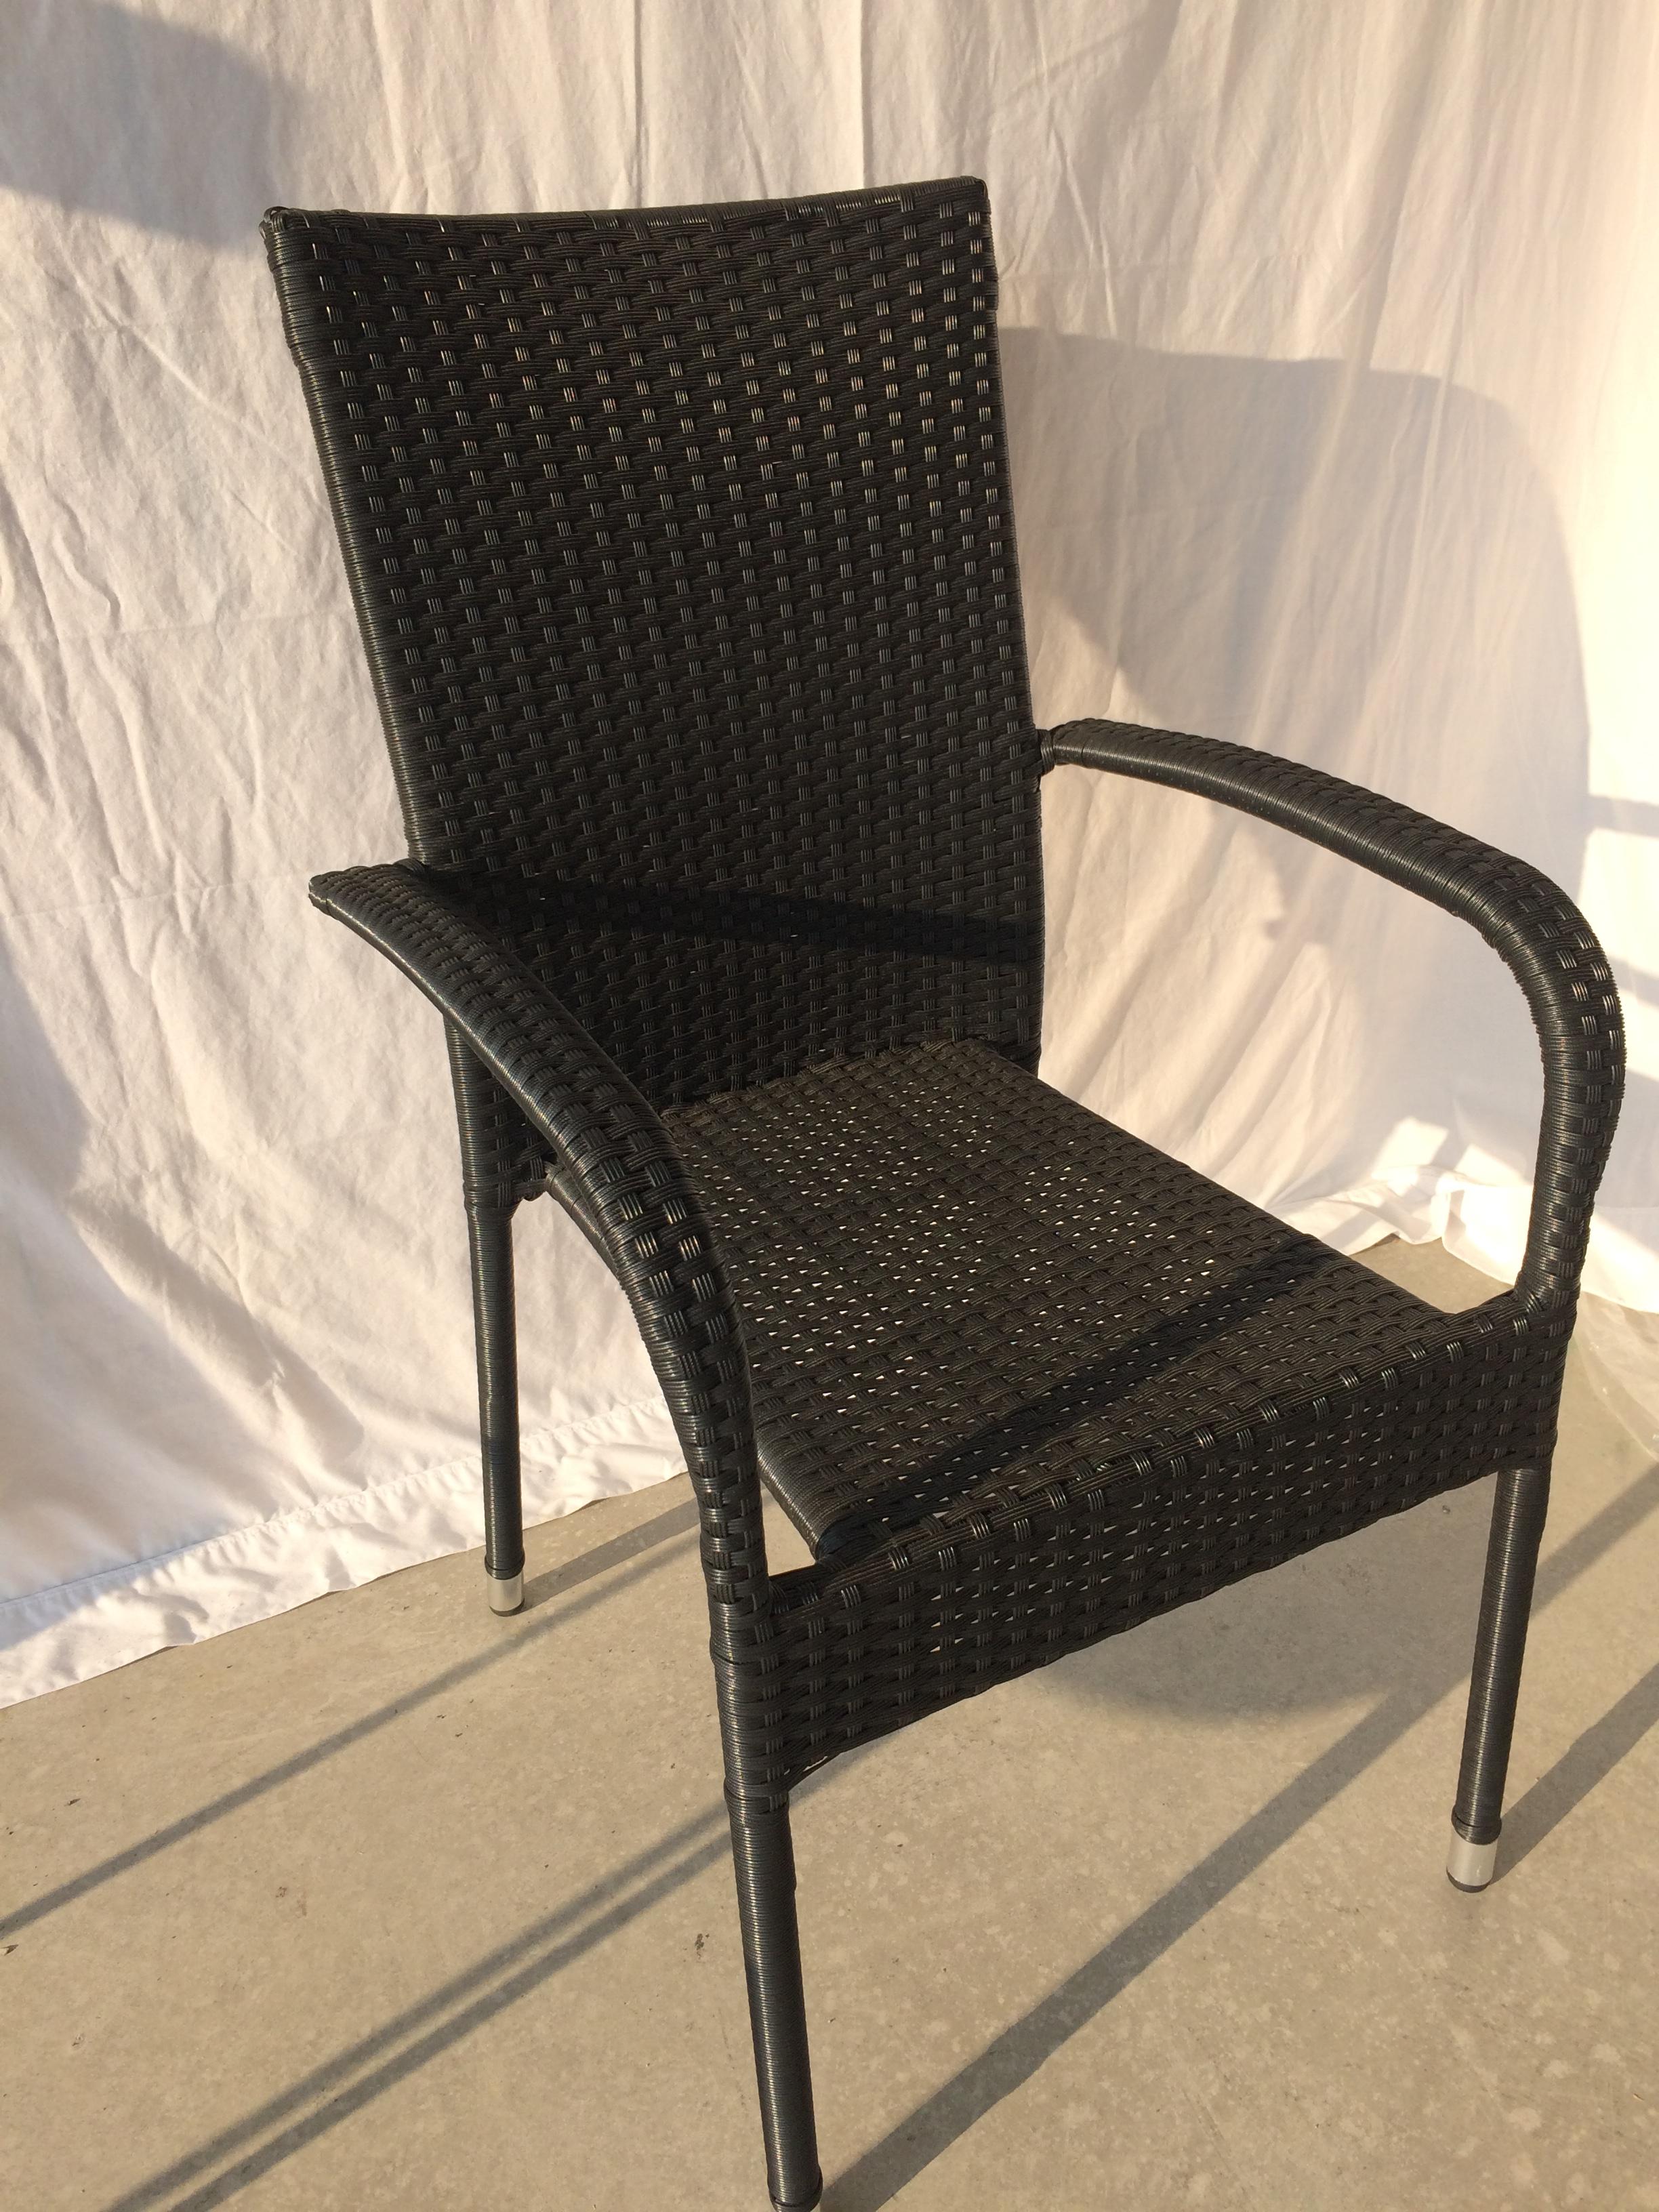 Black Wicker Outdoor Patio Chair